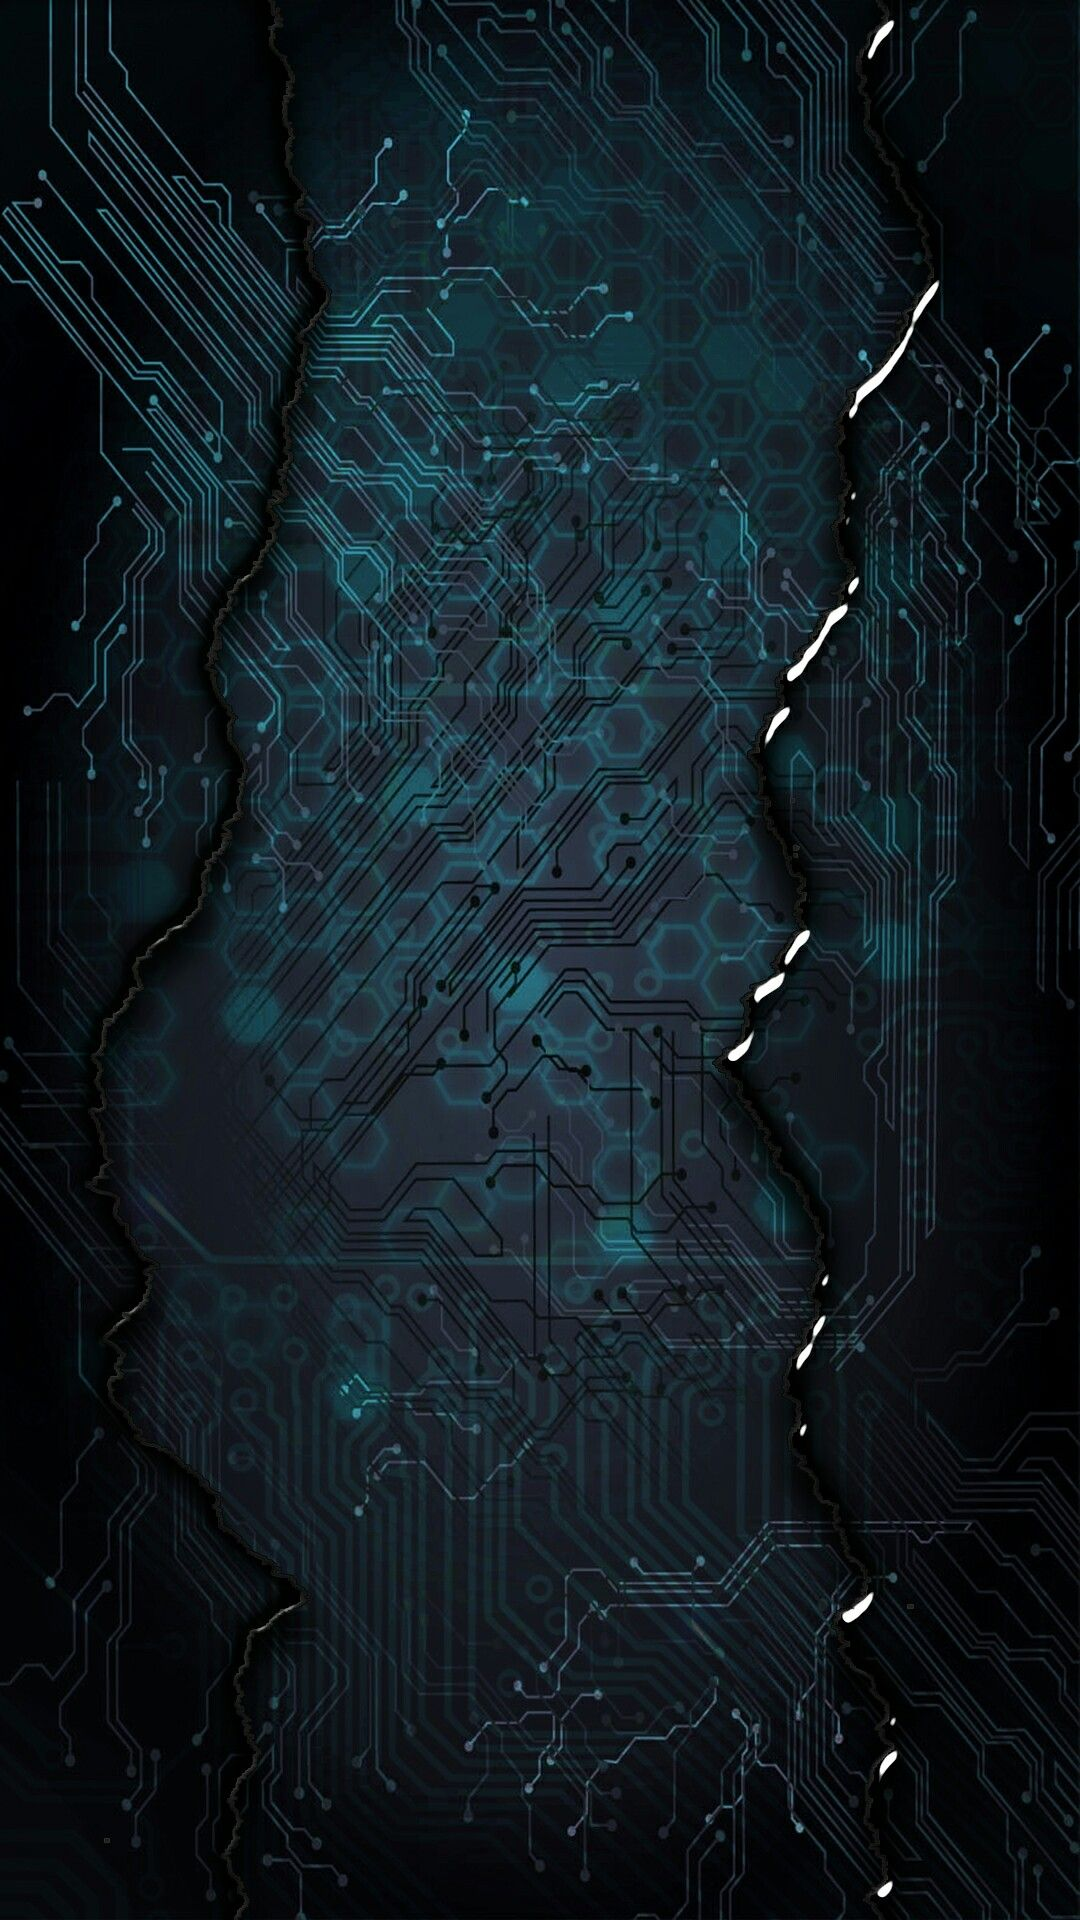 Dark Wallpaper Android Hd